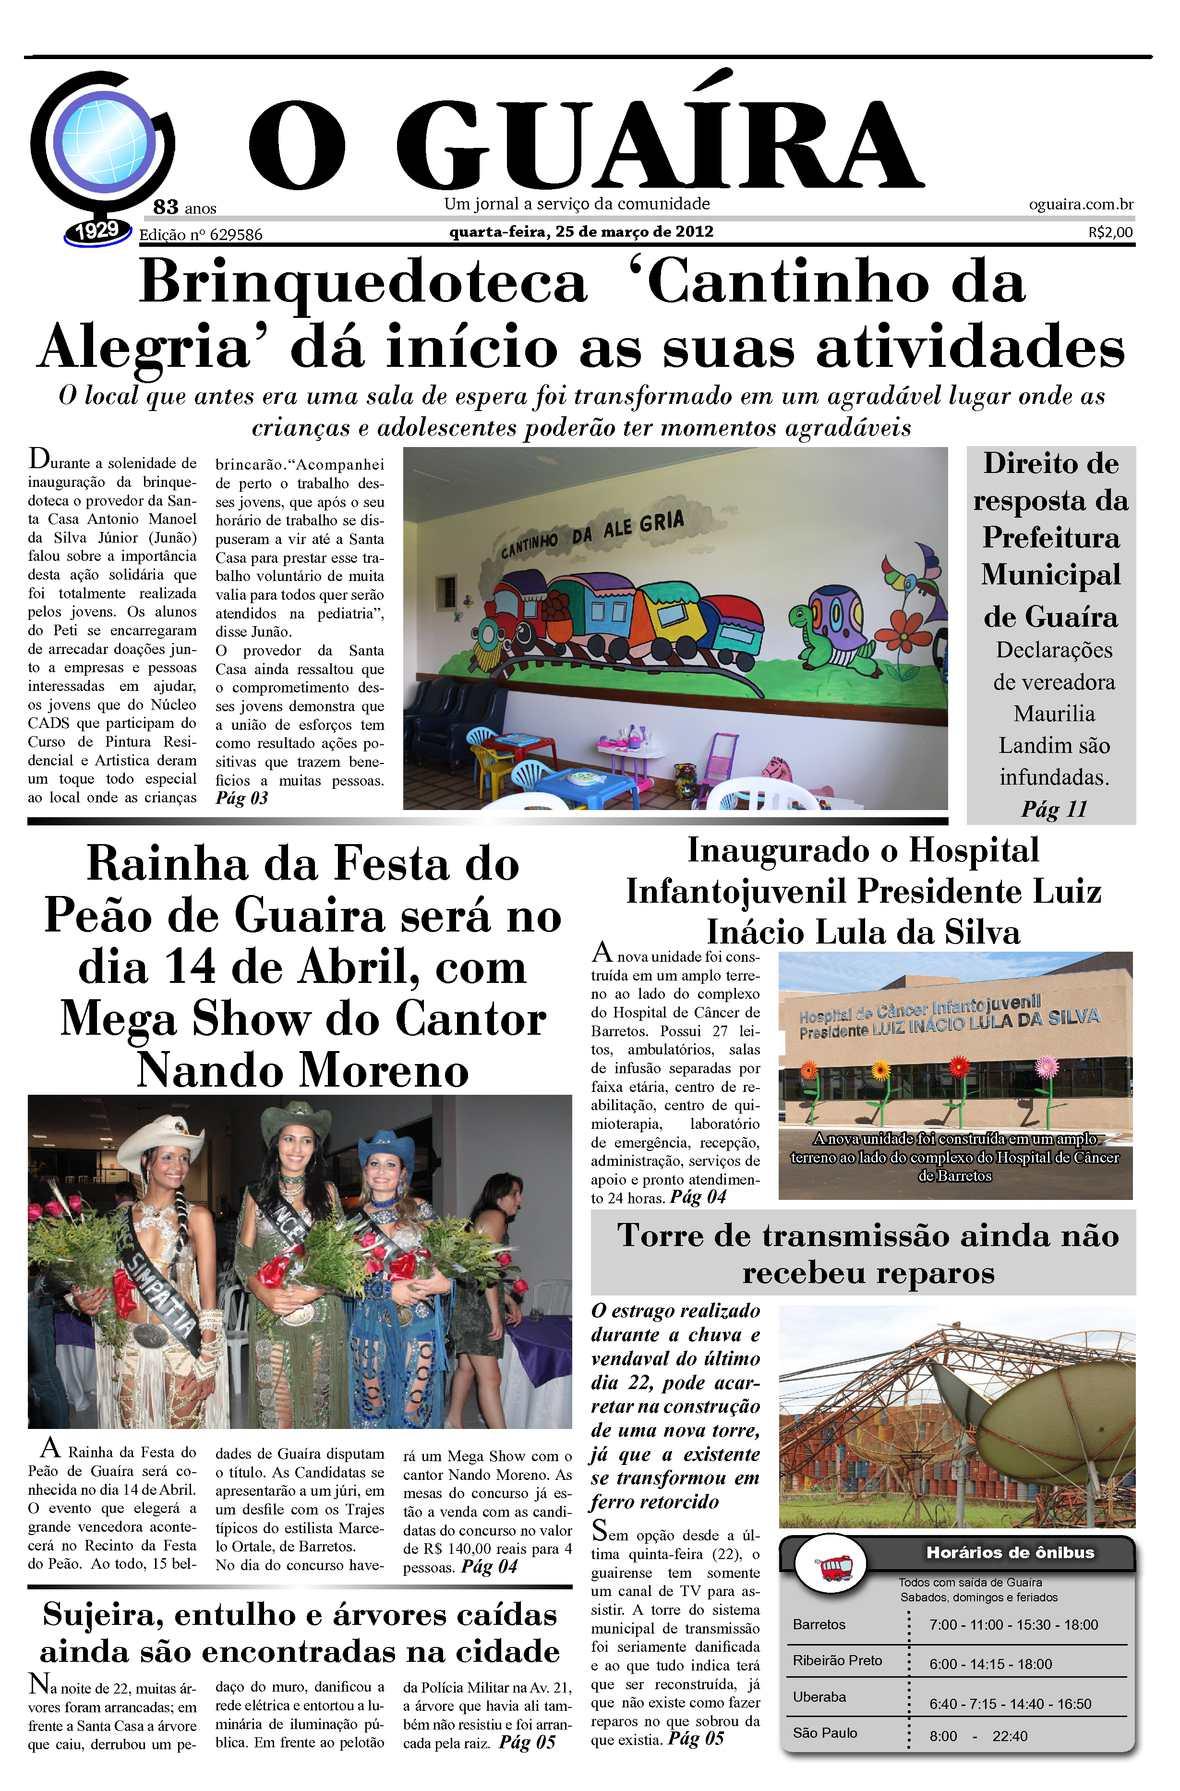 Calaméo - Jornal O Guaira 28 03 2012 032254e37eccd